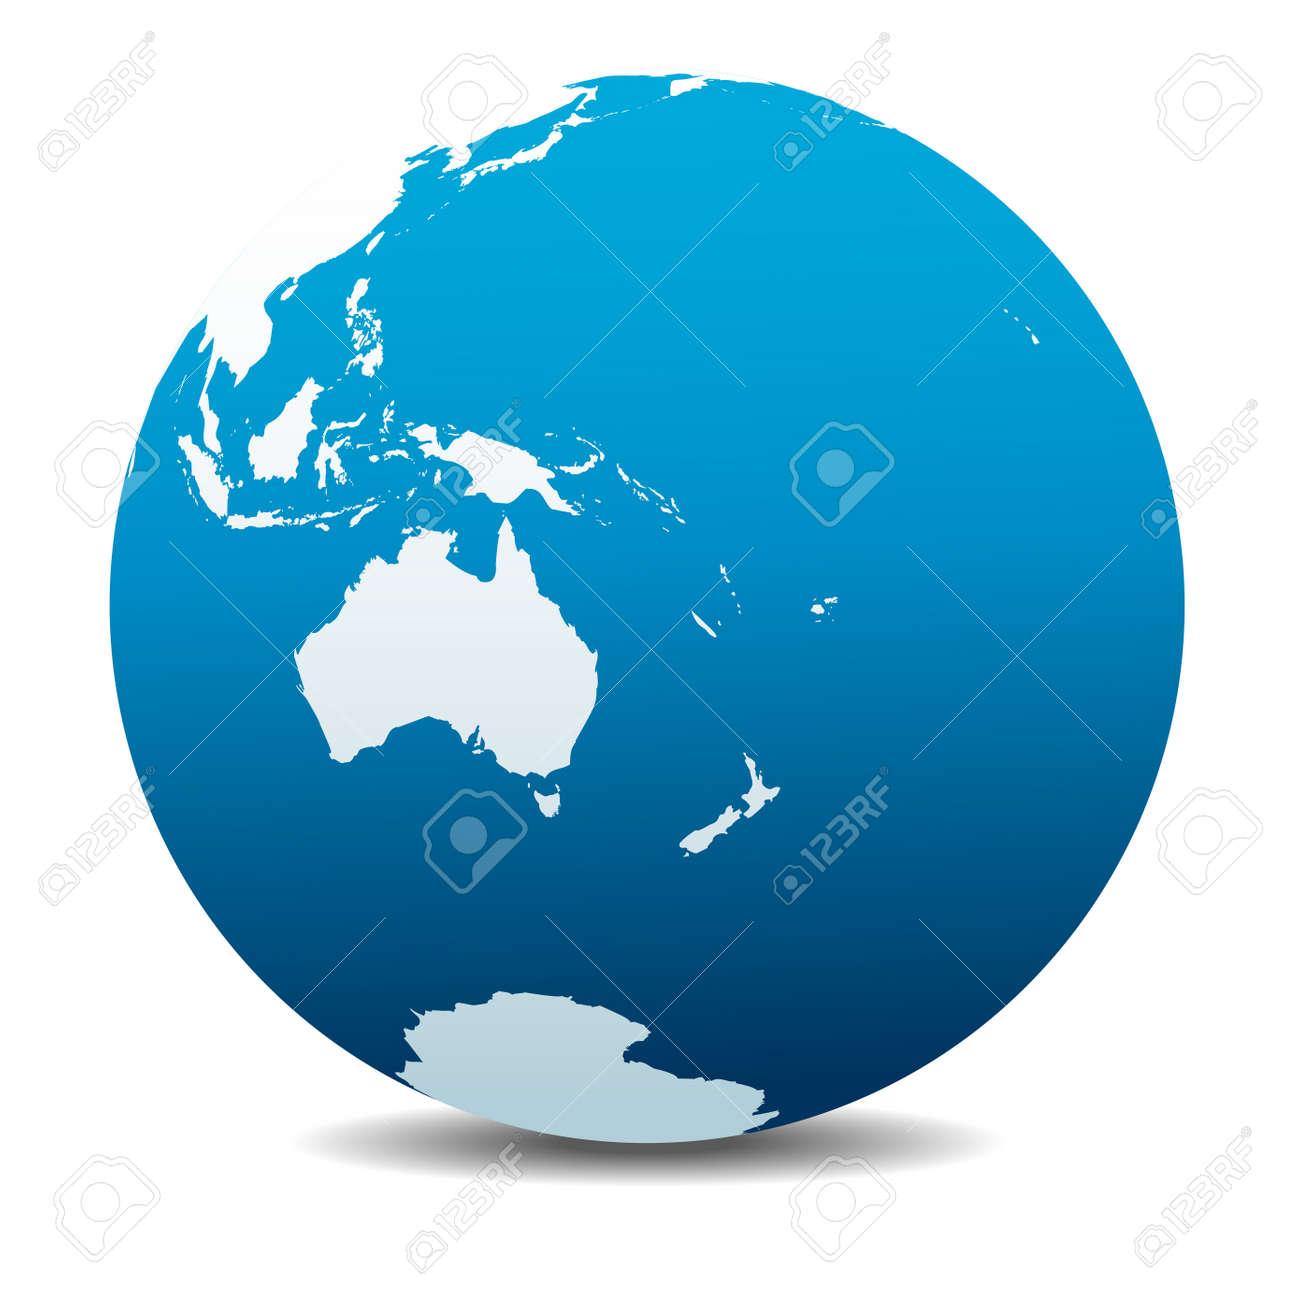 Australia and New Zealand, Global World - 49597277